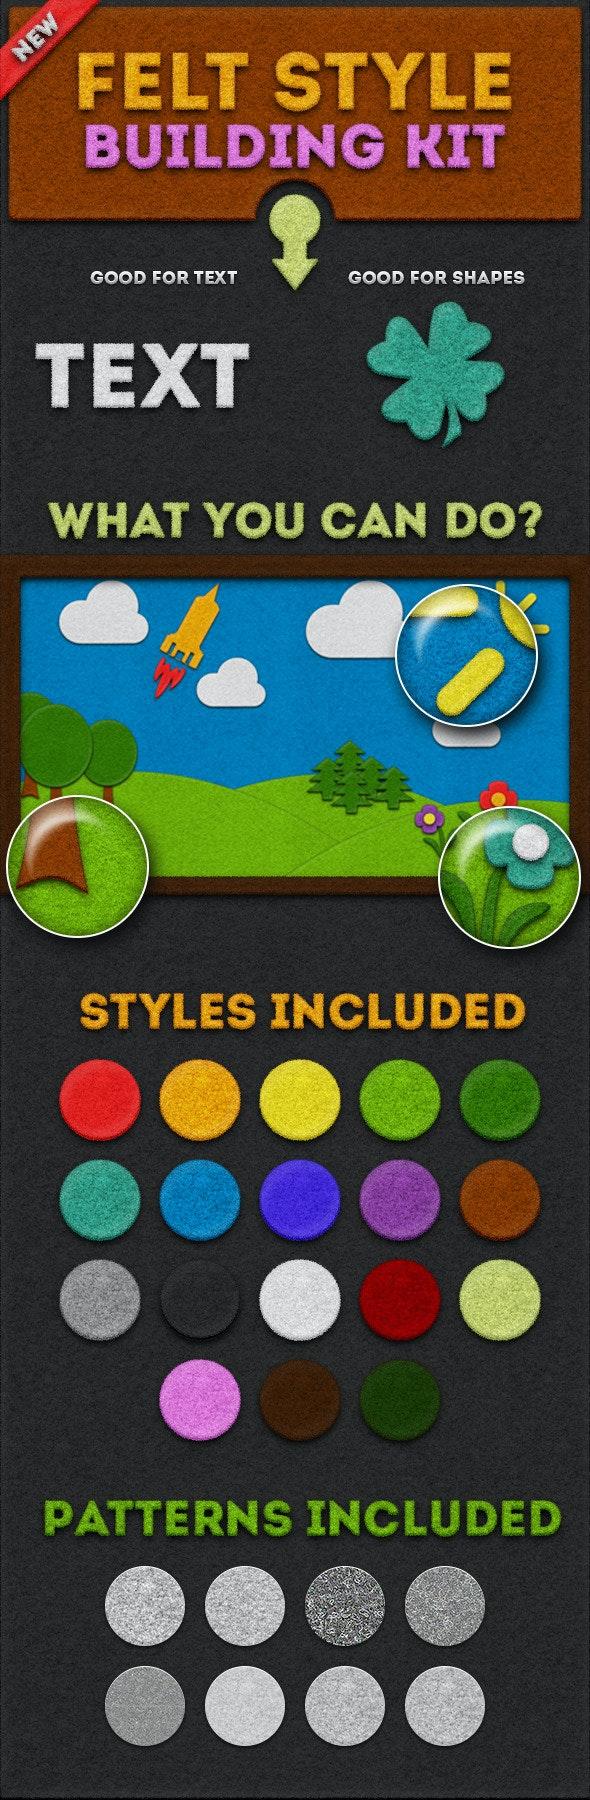 Felt Style Building Kit - Styles Photoshop